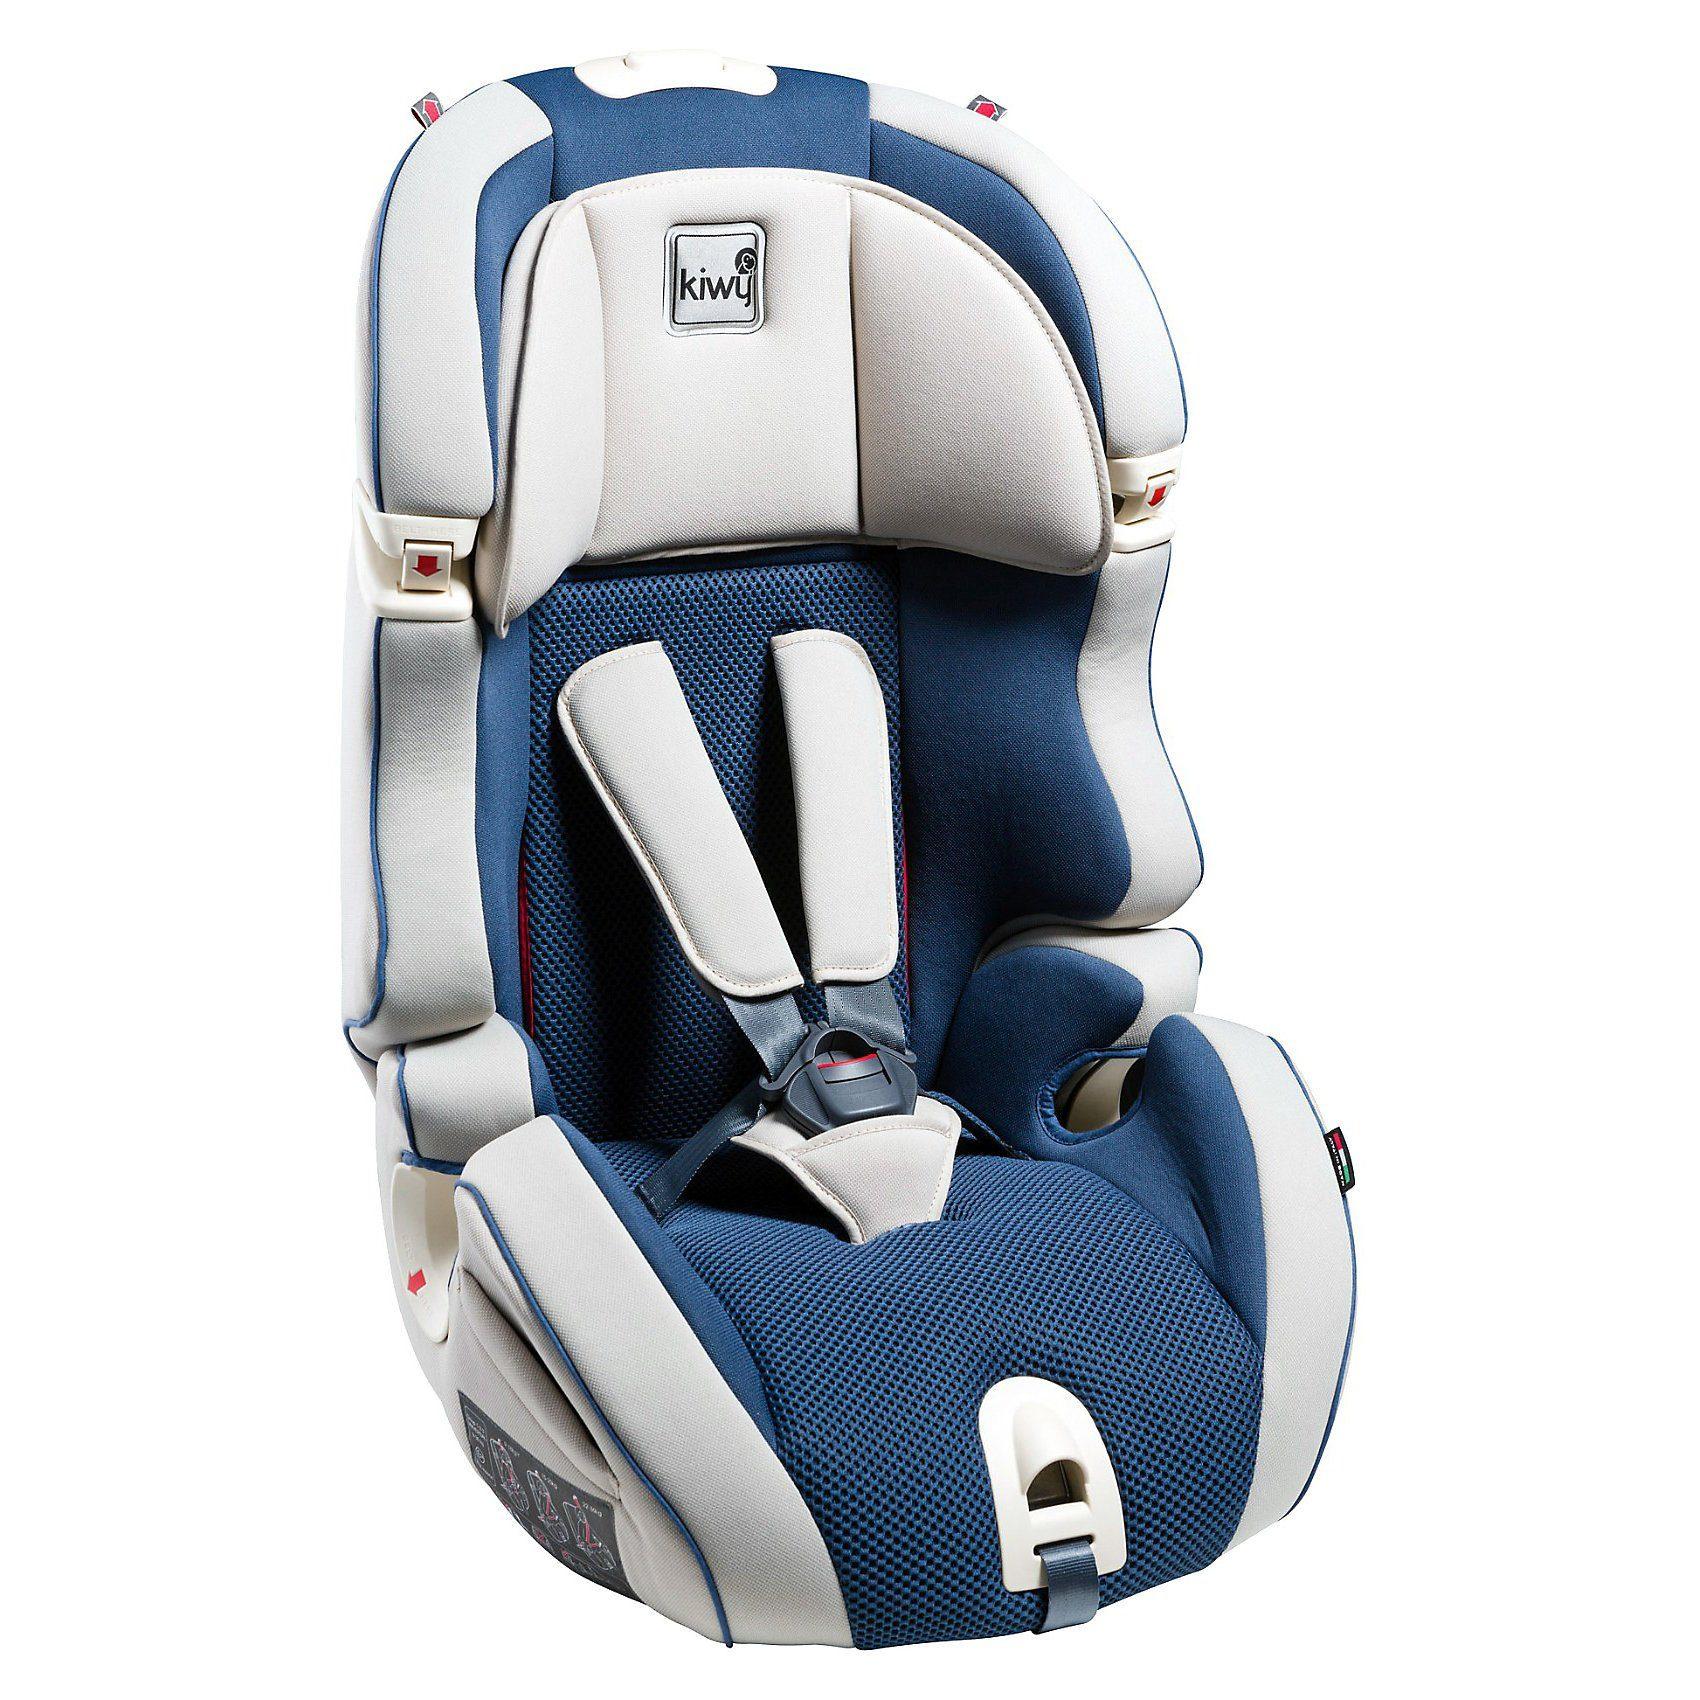 Kiwy Auto-Kindersitz S123, Ocean, 2017